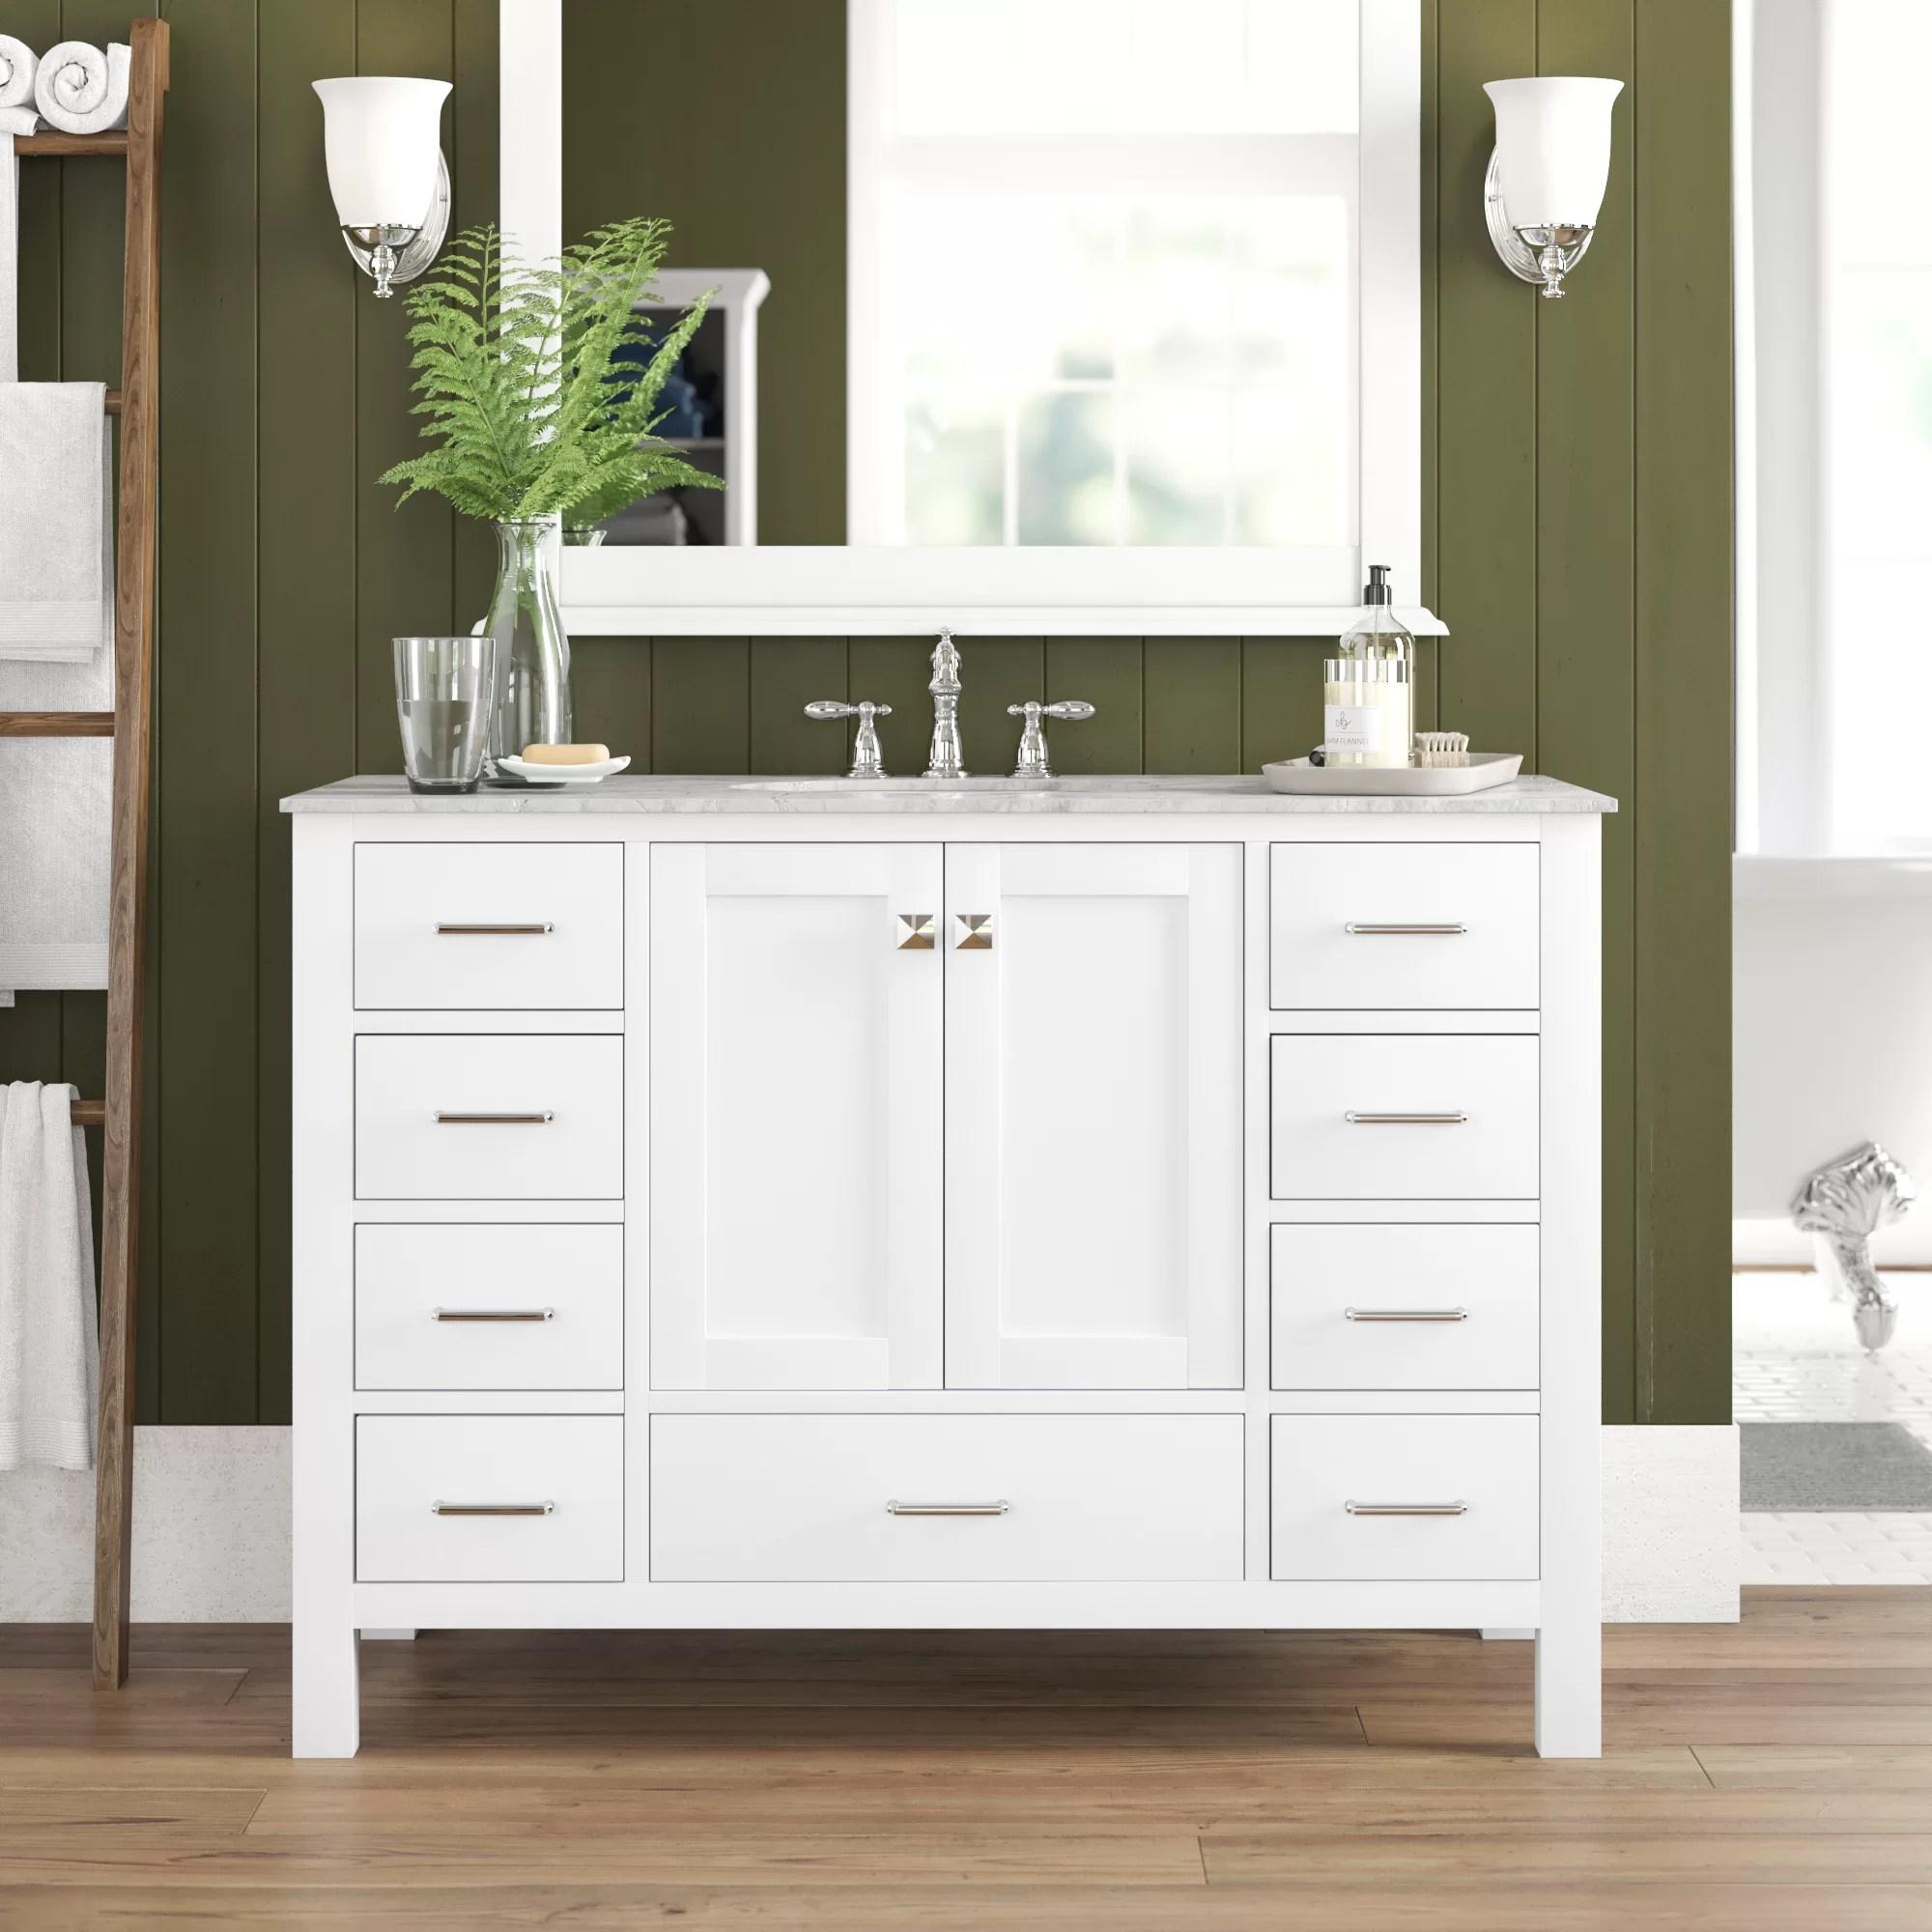 Maynerd Full Cabinet 48 Single Bathroom Vanity Set Reviews Birch Lane